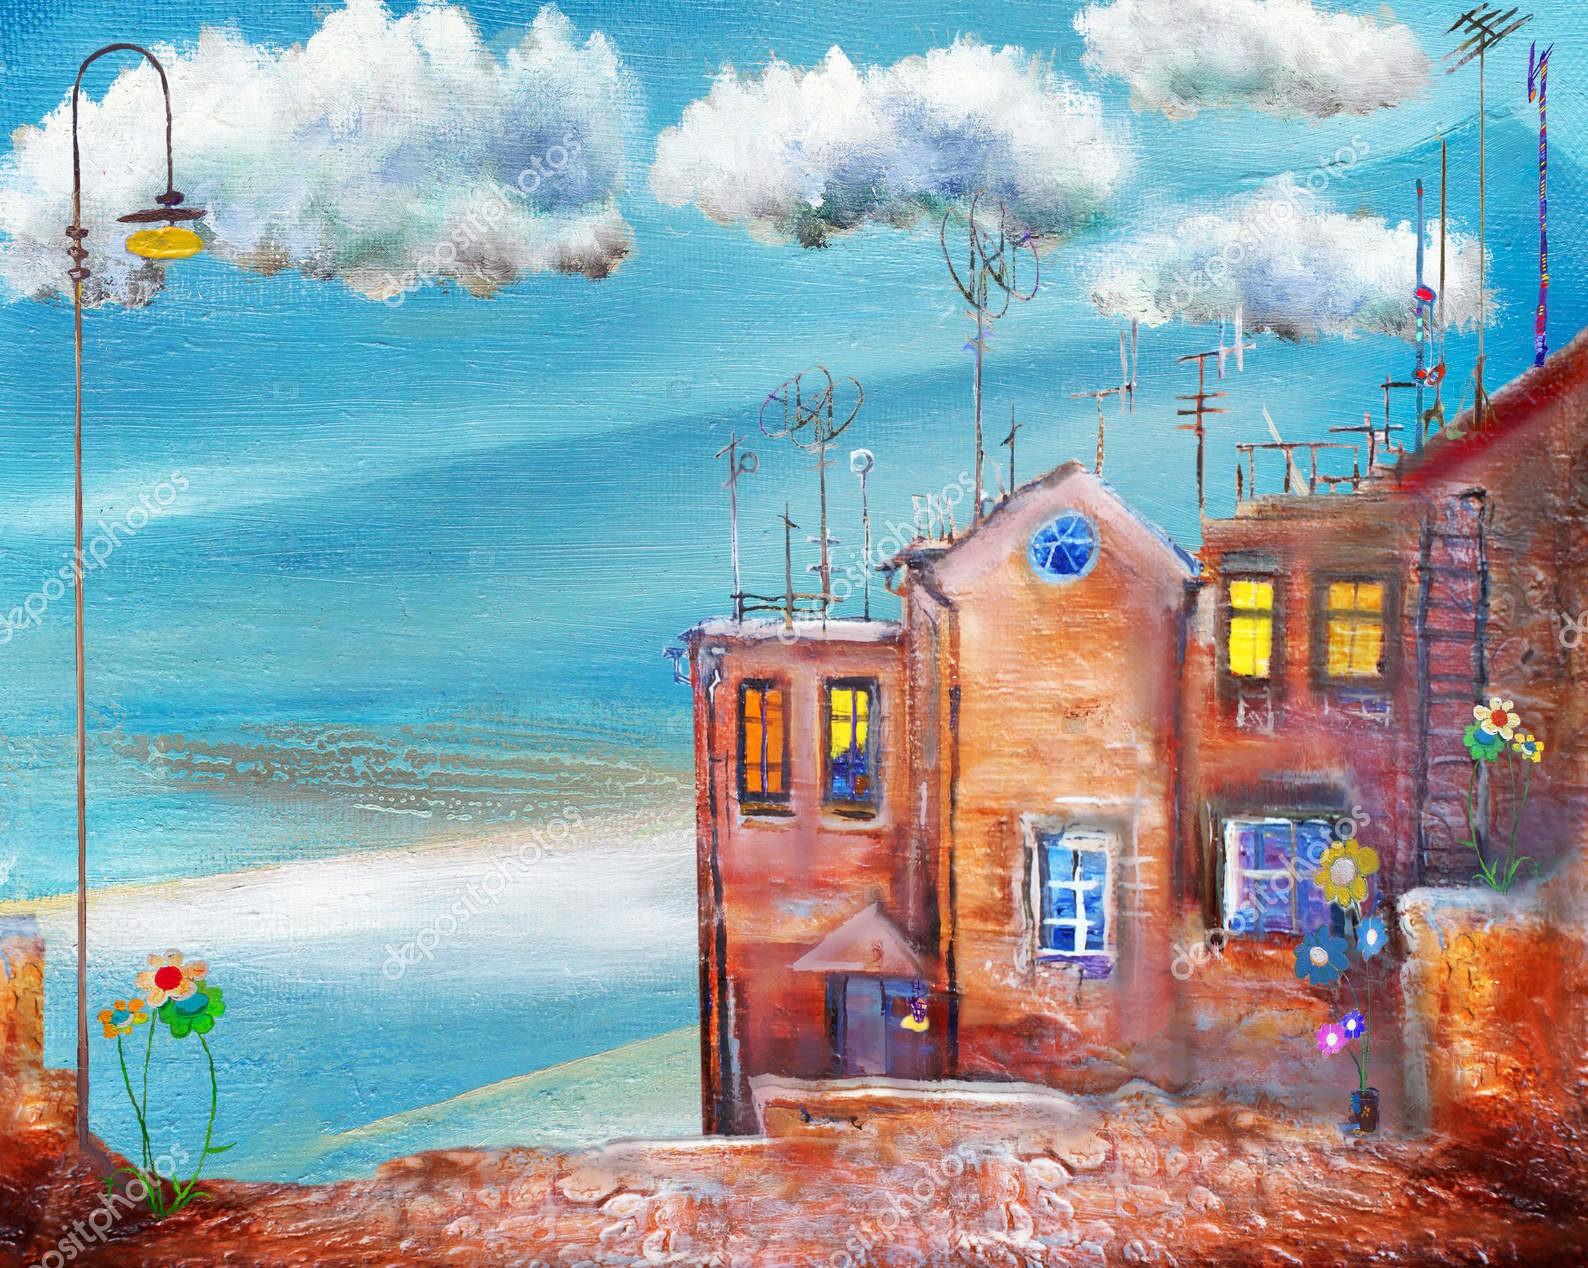 Летний курорт на берегу моря